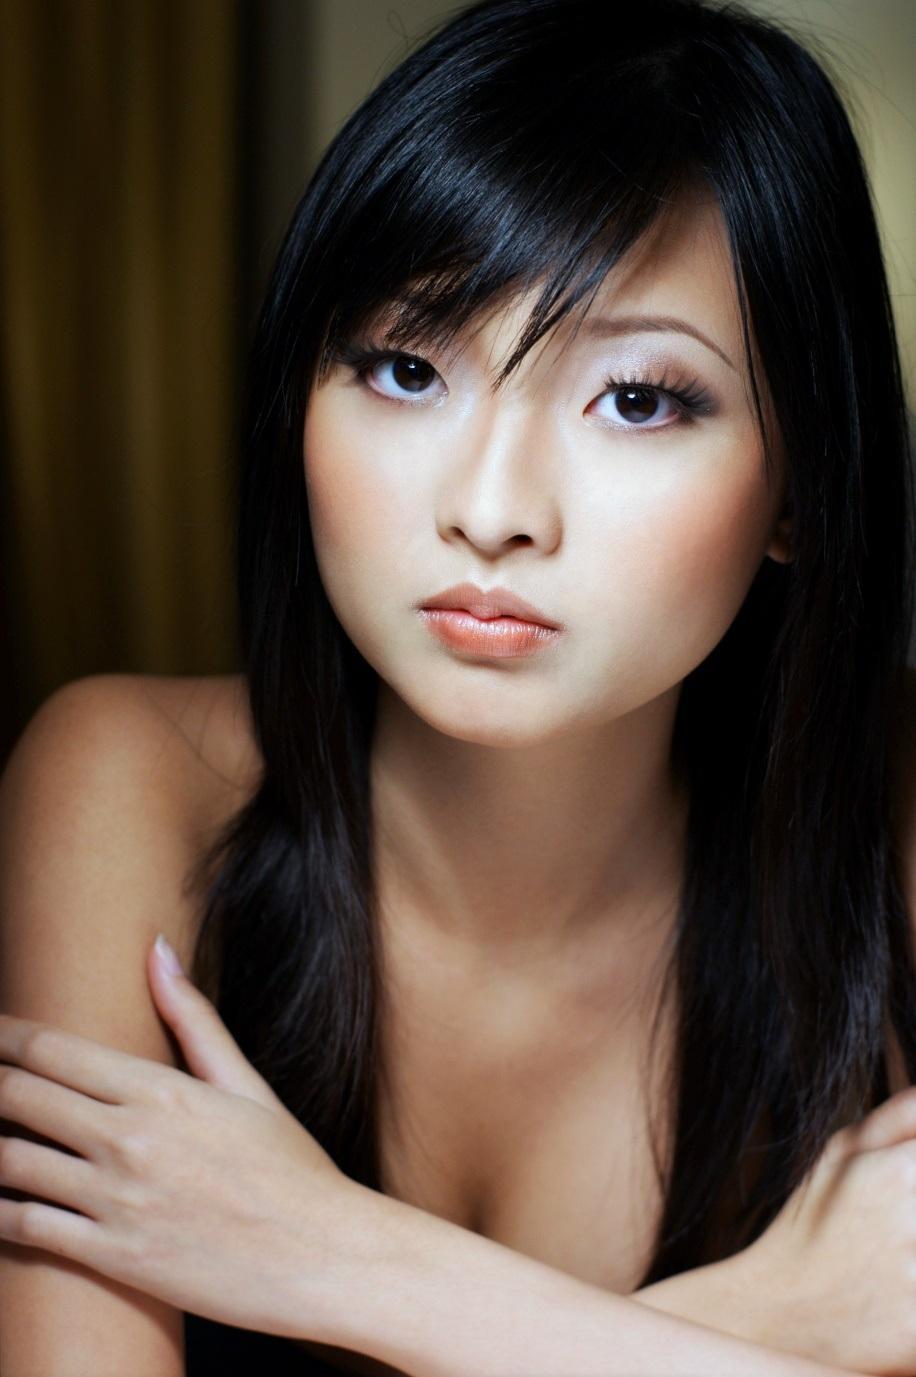 teys: Singapore FHM Models 2012 Winner Jamie Ang Leaked